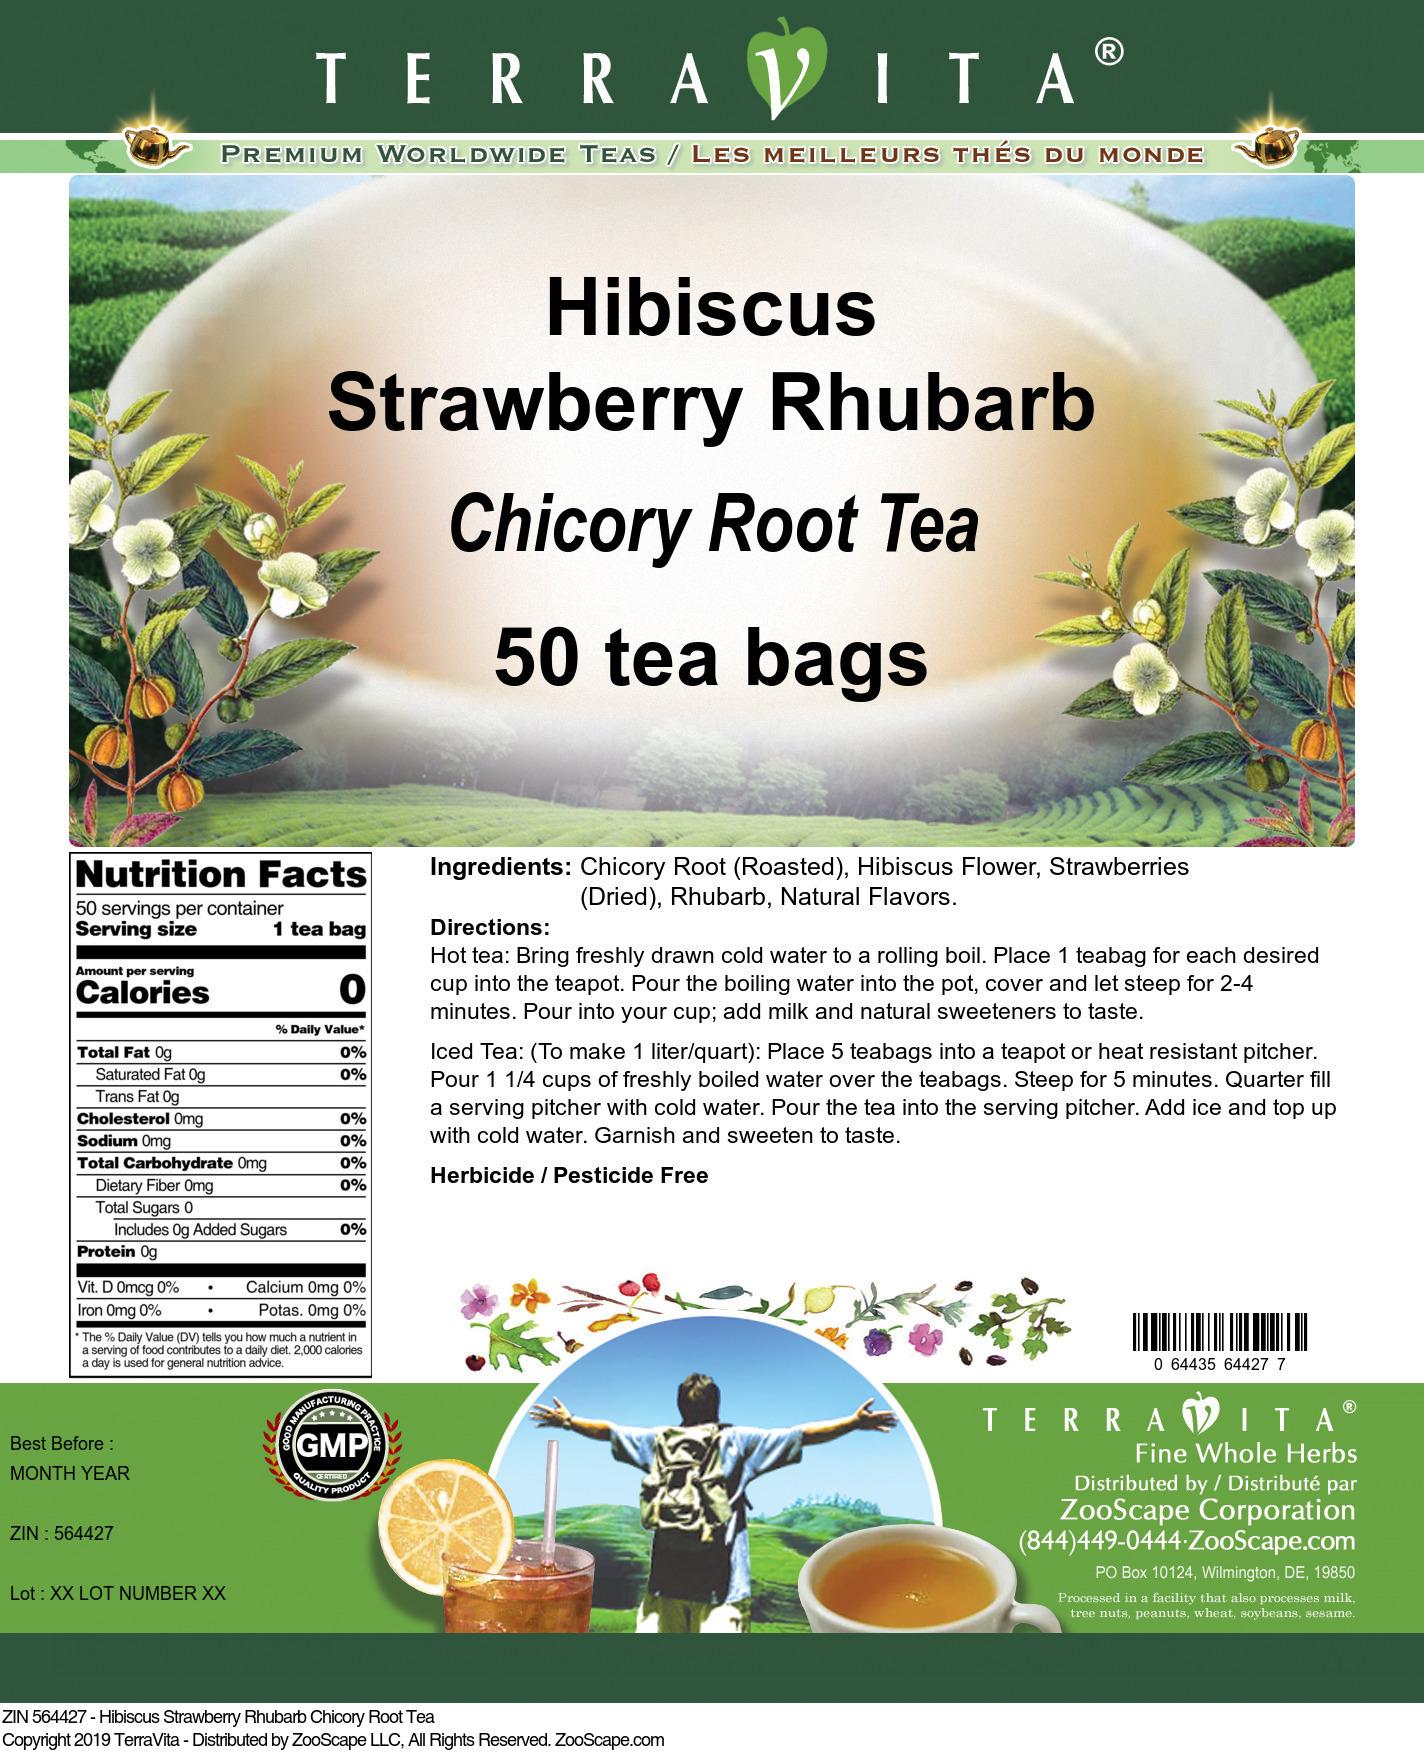 Hibiscus Strawberry Rhubarb Chicory Root Tea